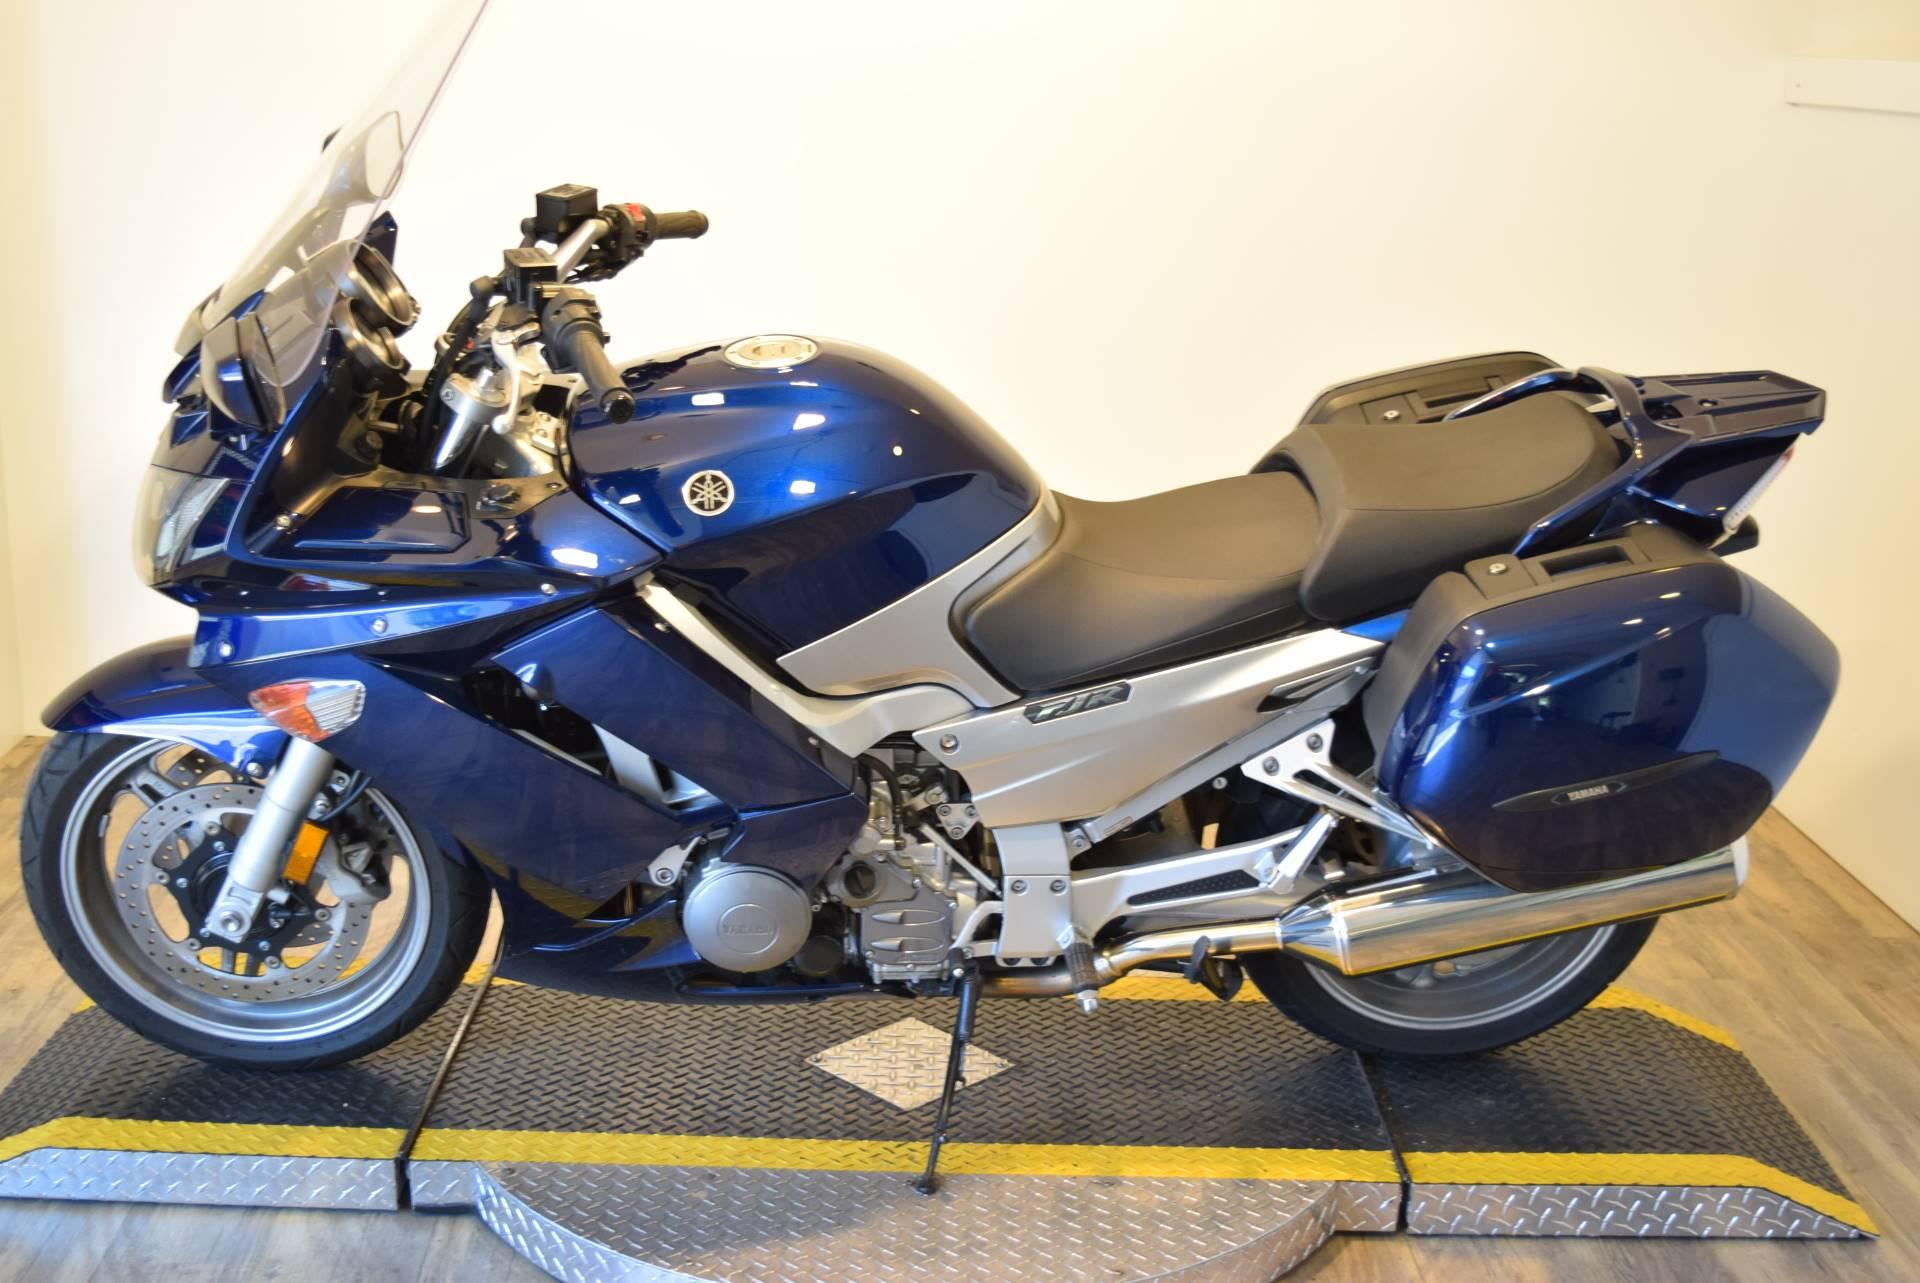 2012 Yamaha FJR1300A 10